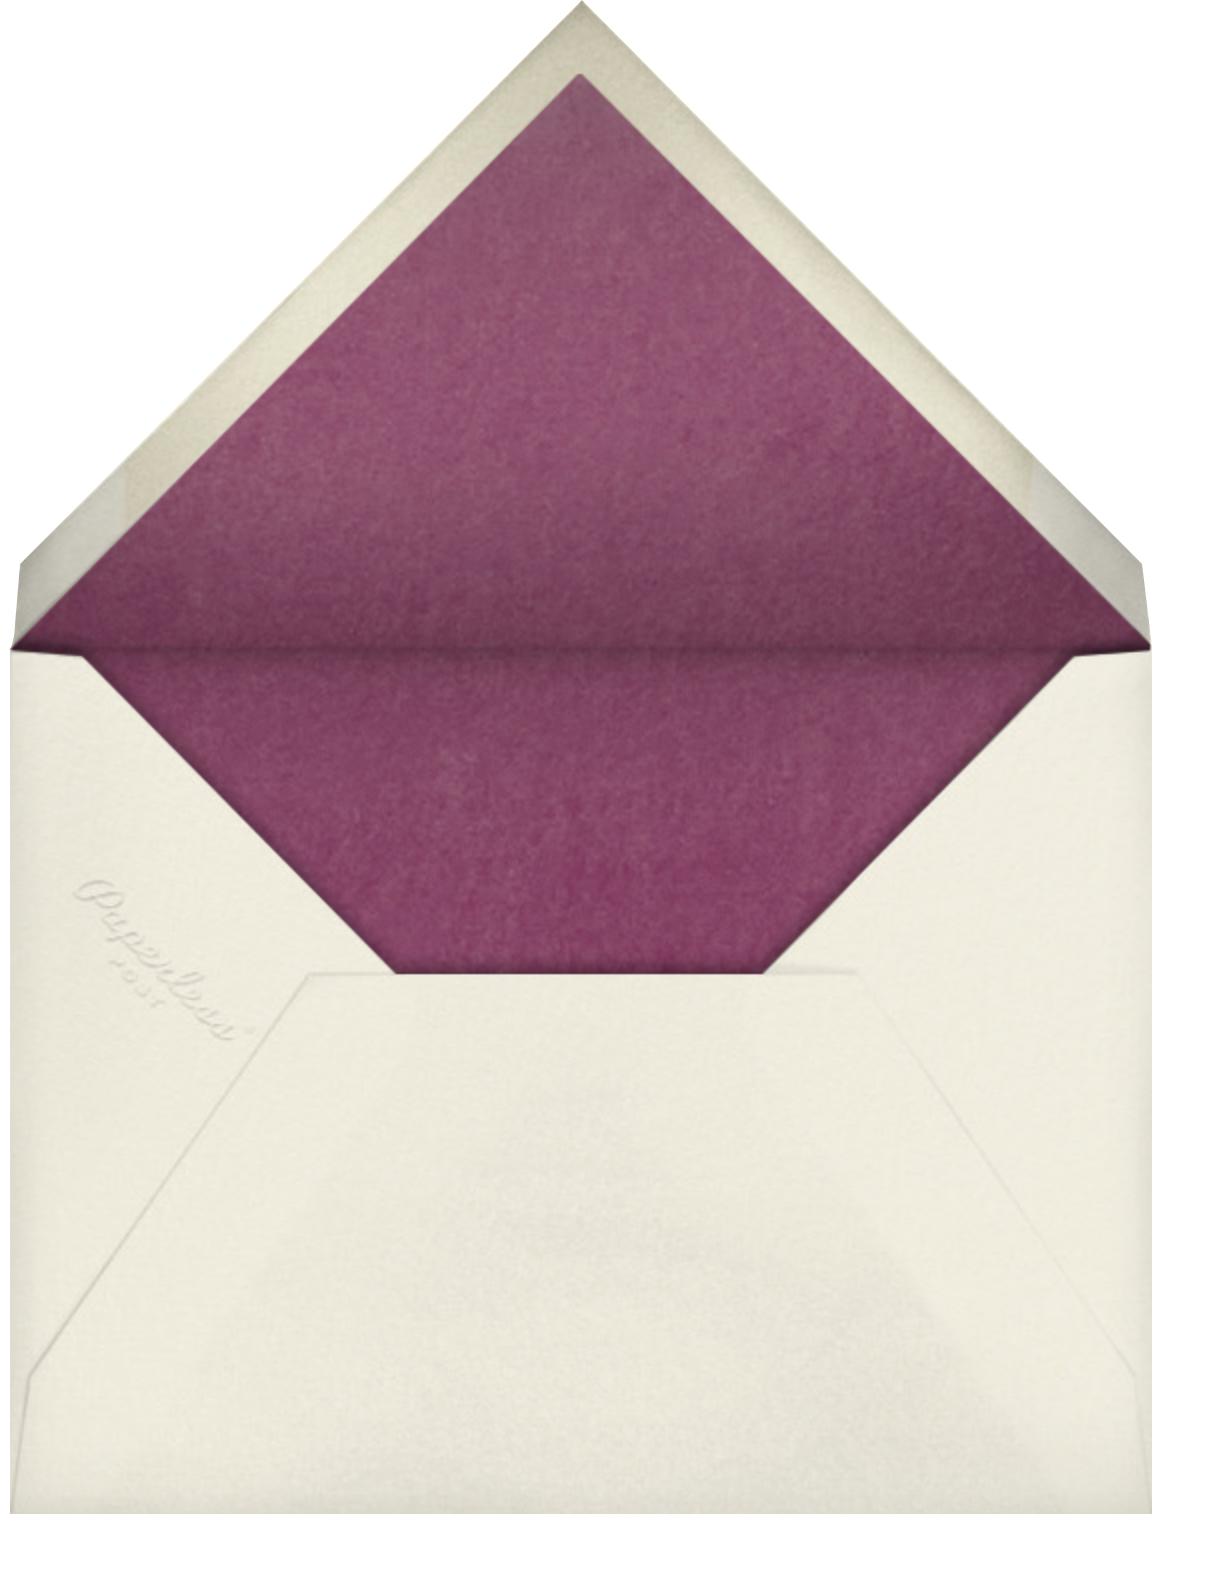 Painted Pomegranates Photo - Paperless Post - Rosh Hashanah - envelope back